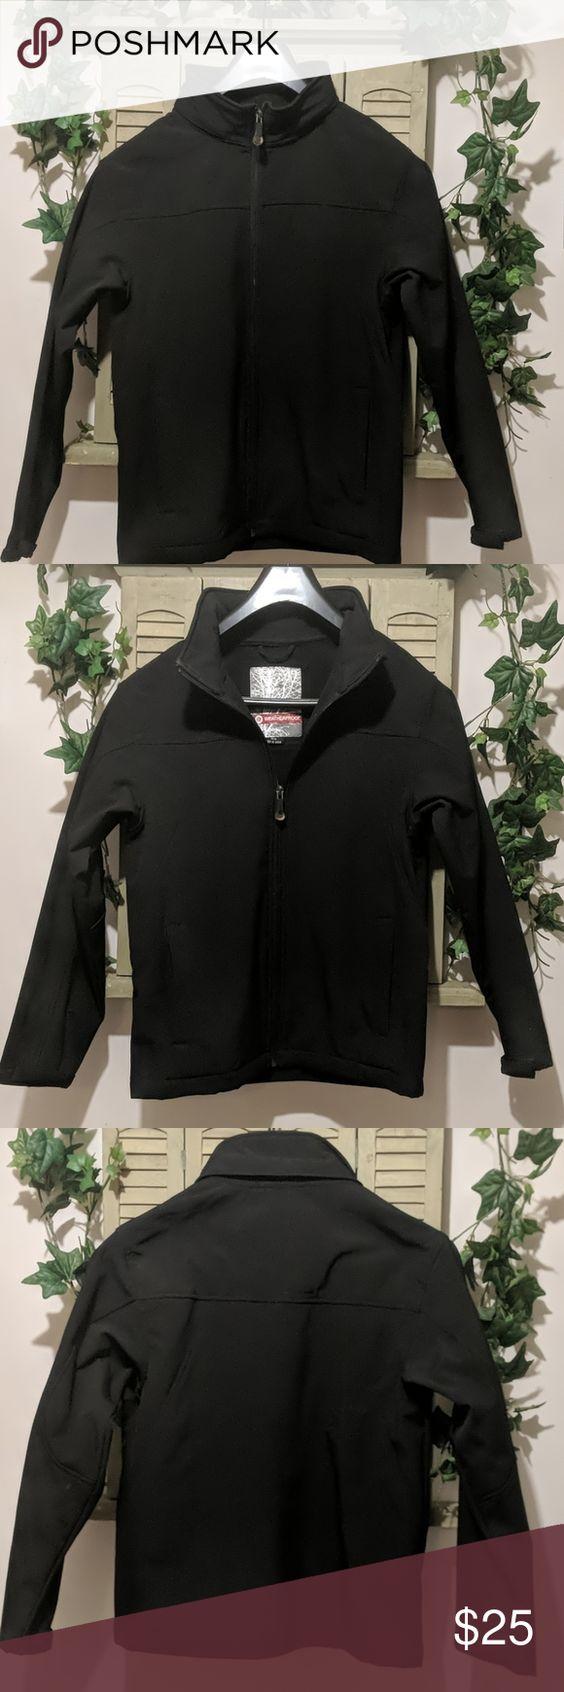 Weatherproof Casual Jacket For Boys Weatherproof Jacket Casual Jacket Kids Winter Jackets [ 1692 x 564 Pixel ]